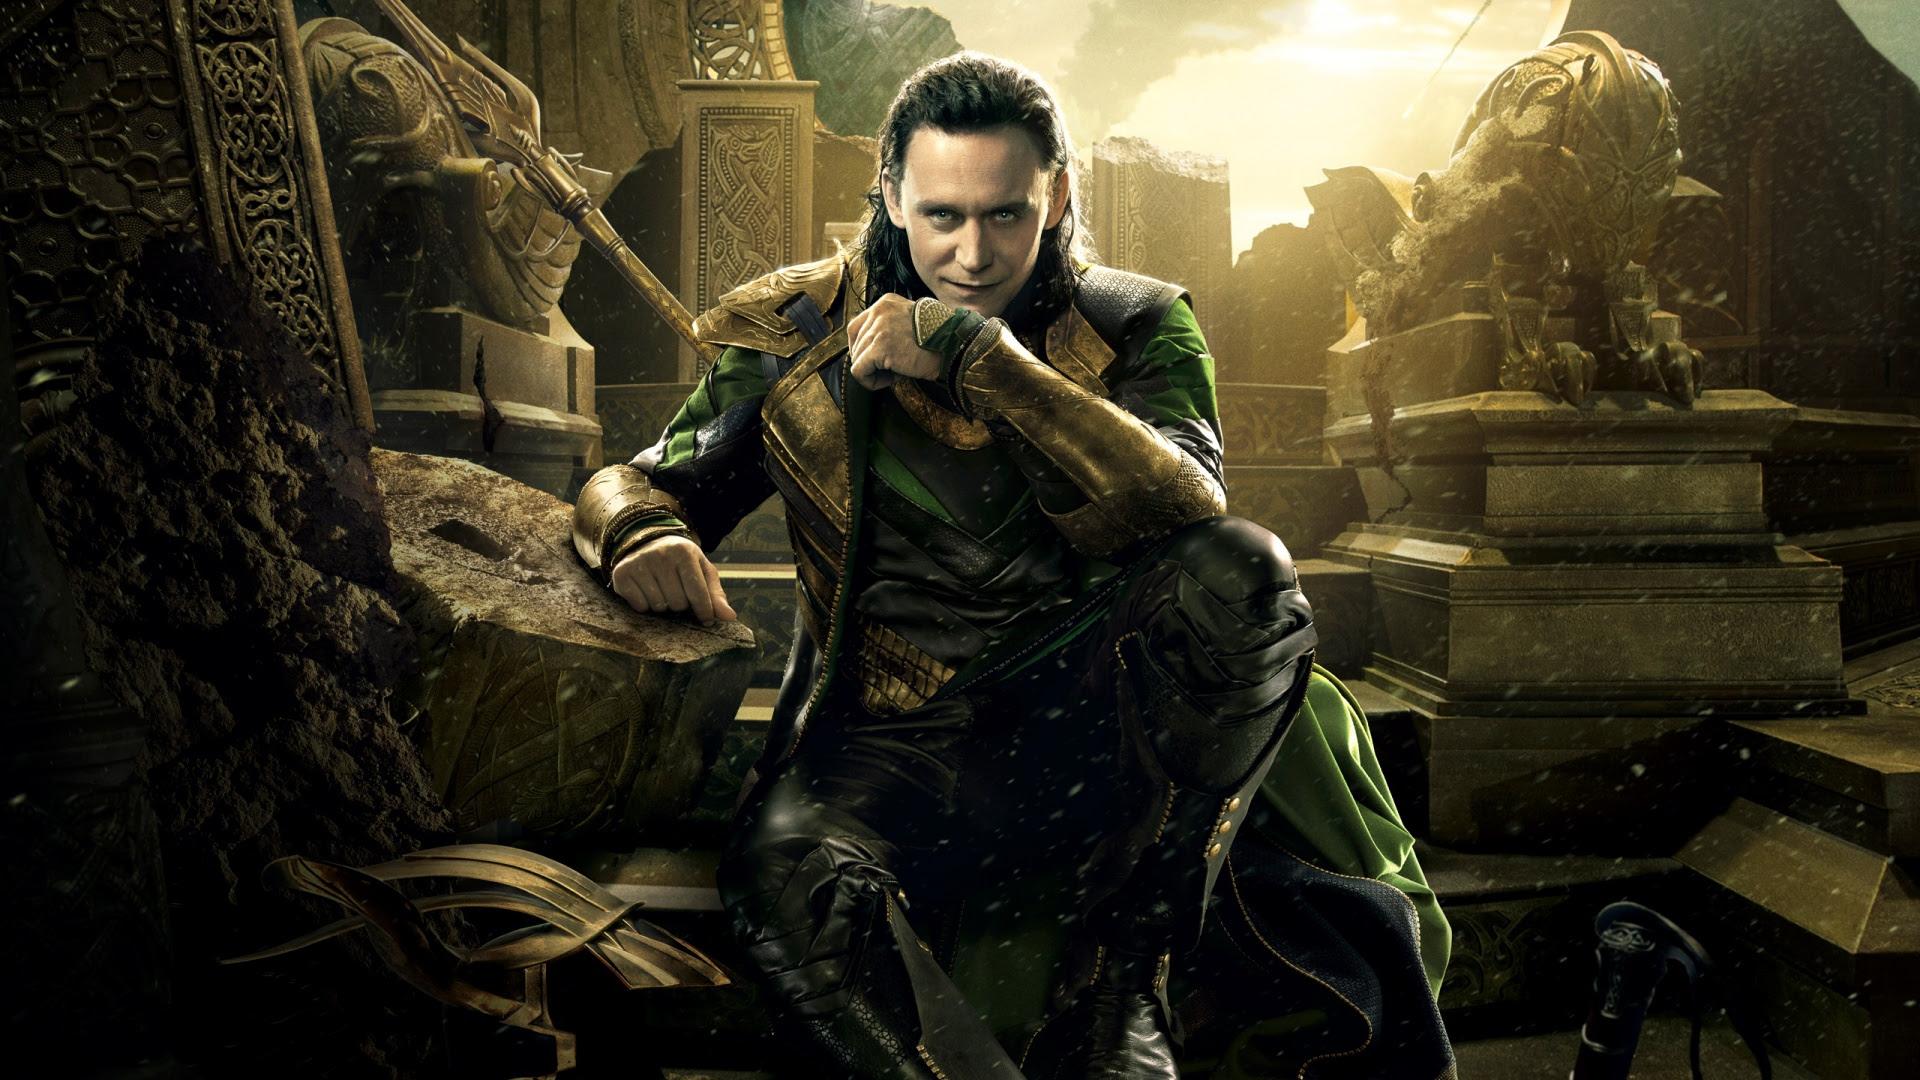 Thor The Dark World Wallpapers Wallpaper High Definition High